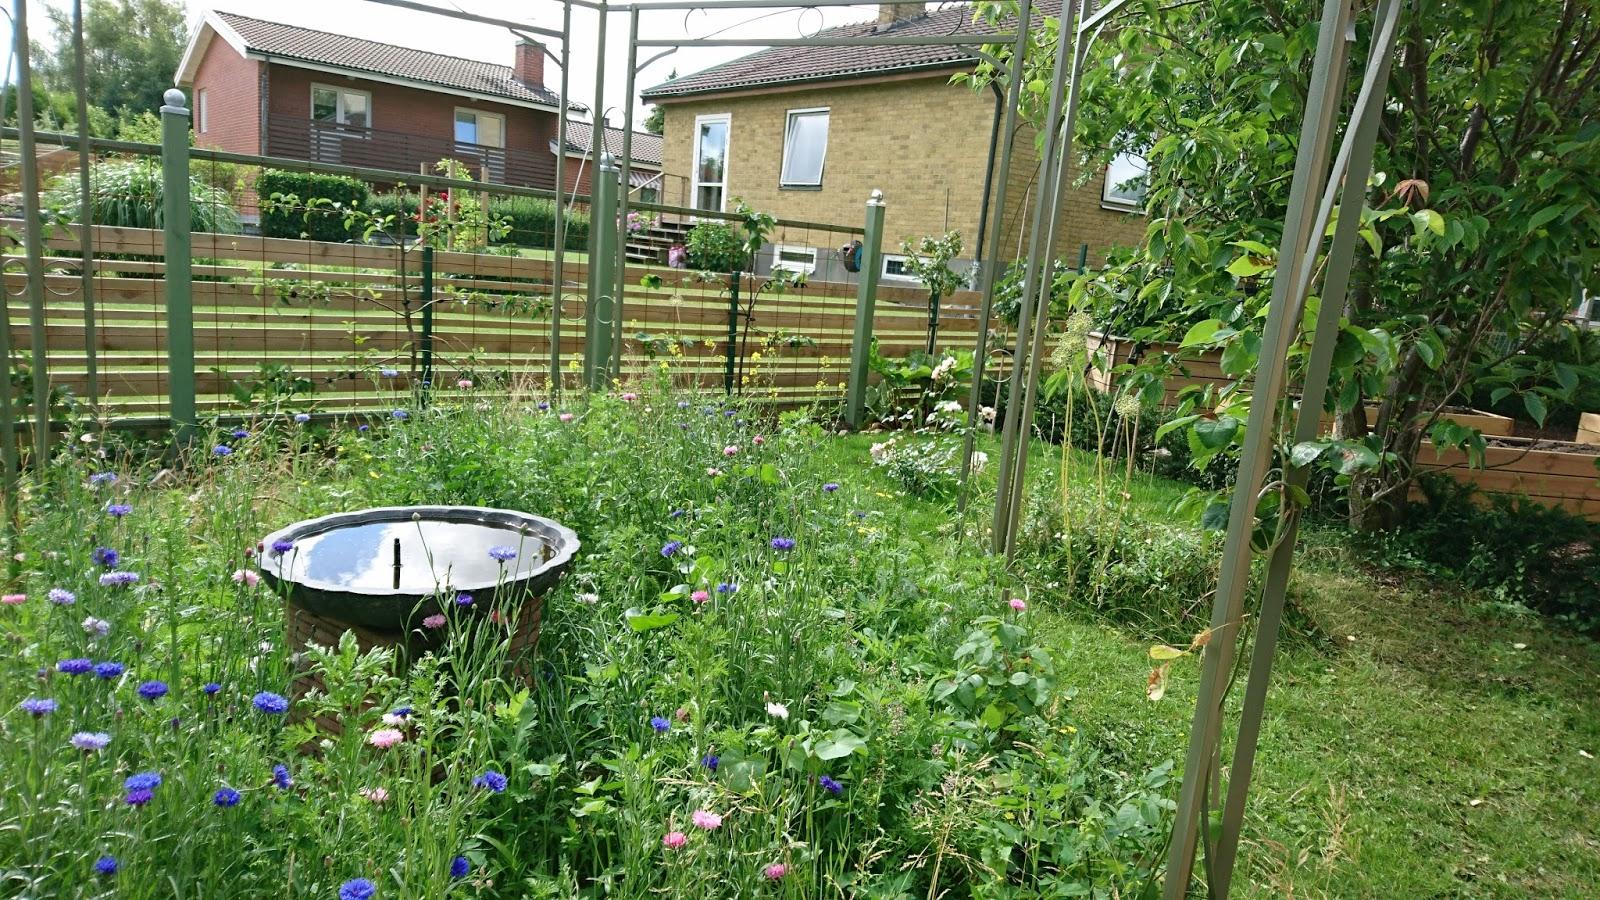 Trädgård plank trädgård : Jugendhuset